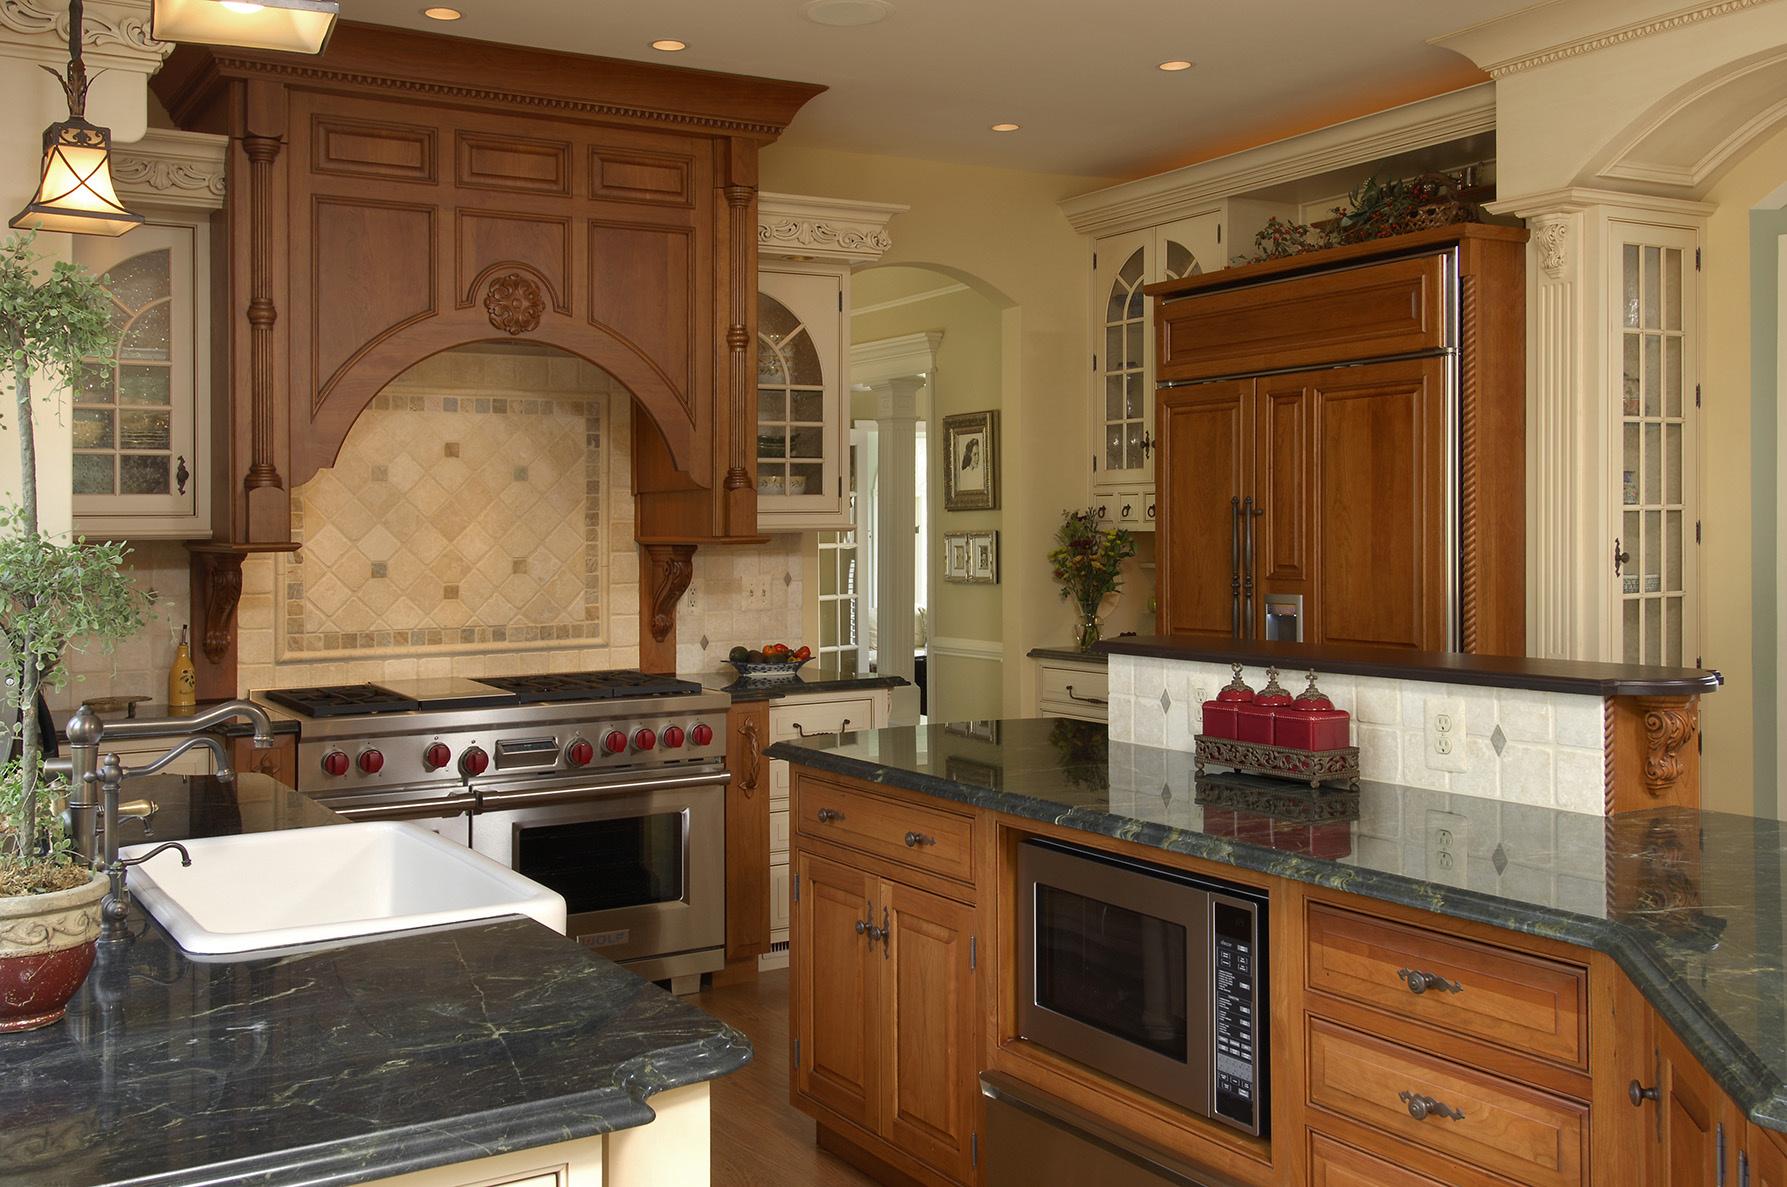 home remodeling, kitchen remodeling,kitchen renovation, home remodeling northern virginia, northern virginia kitchen design, luxury kitchen design, luxury kitchen remodeling